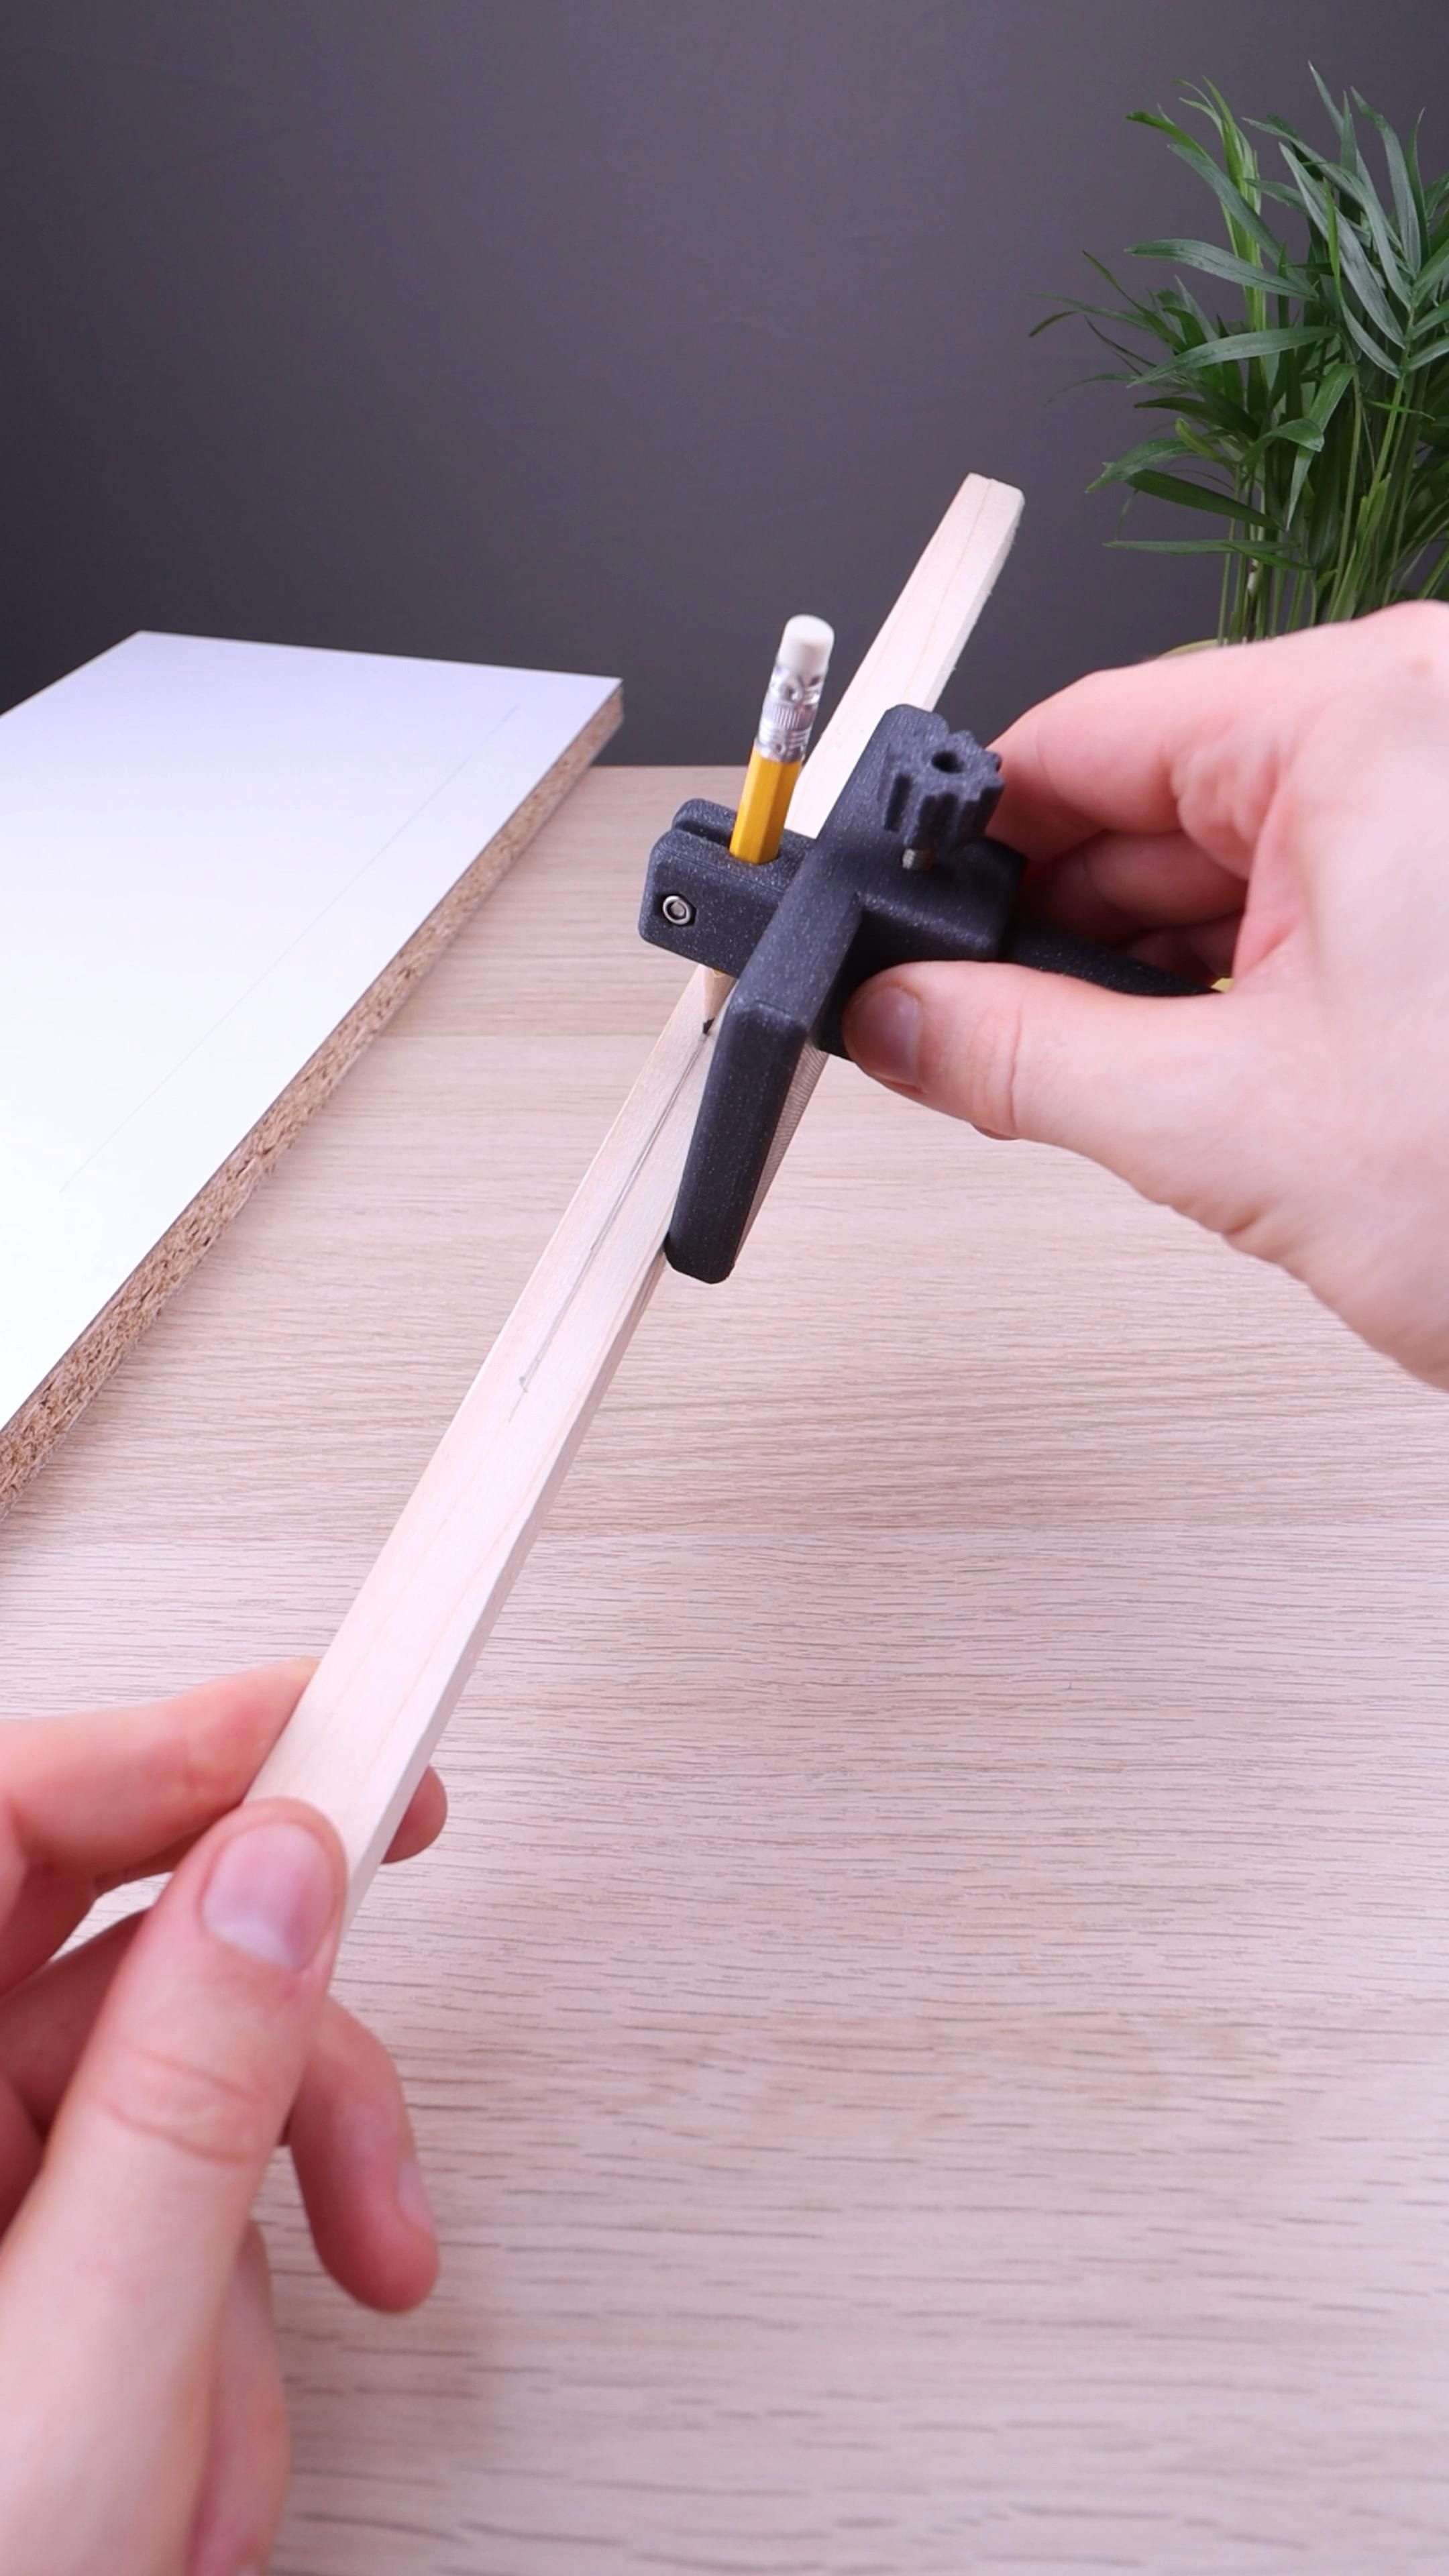 3D Printed DIY Woodworking Marking Tool